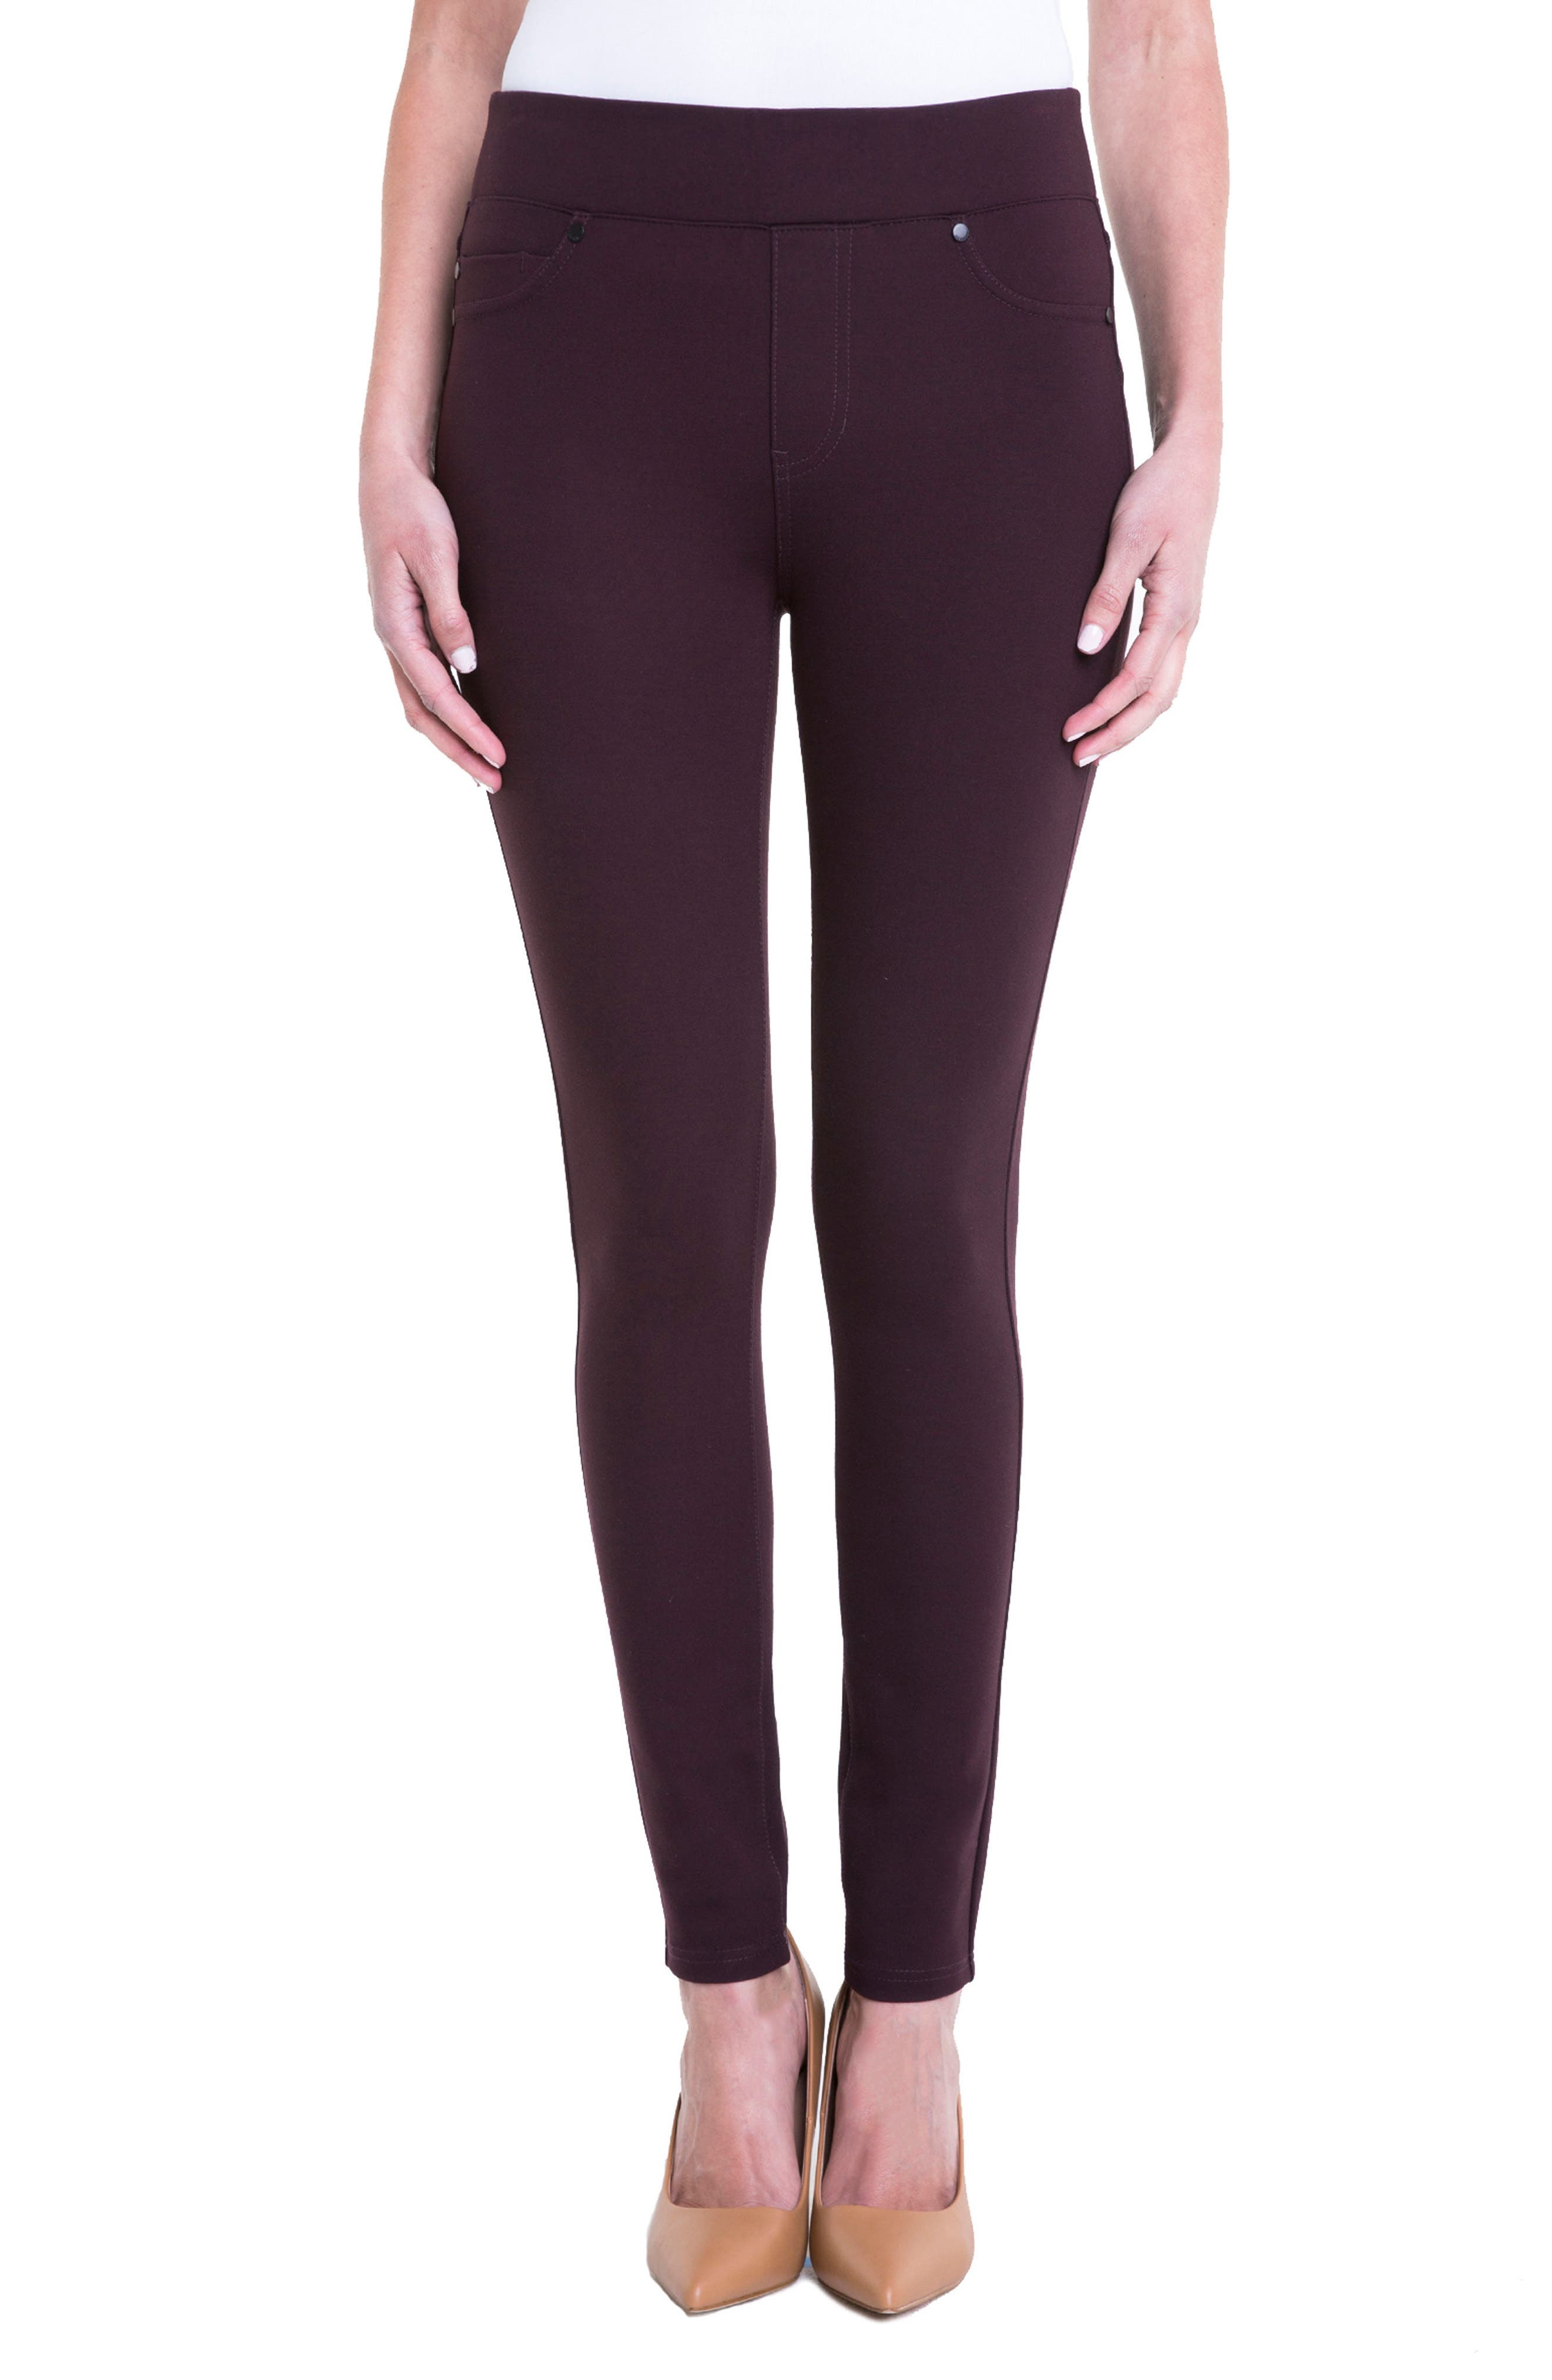 Alternate Image 1 Selected - Liverpool Jeans Company Piper Hugger Leggings (Aubergine)